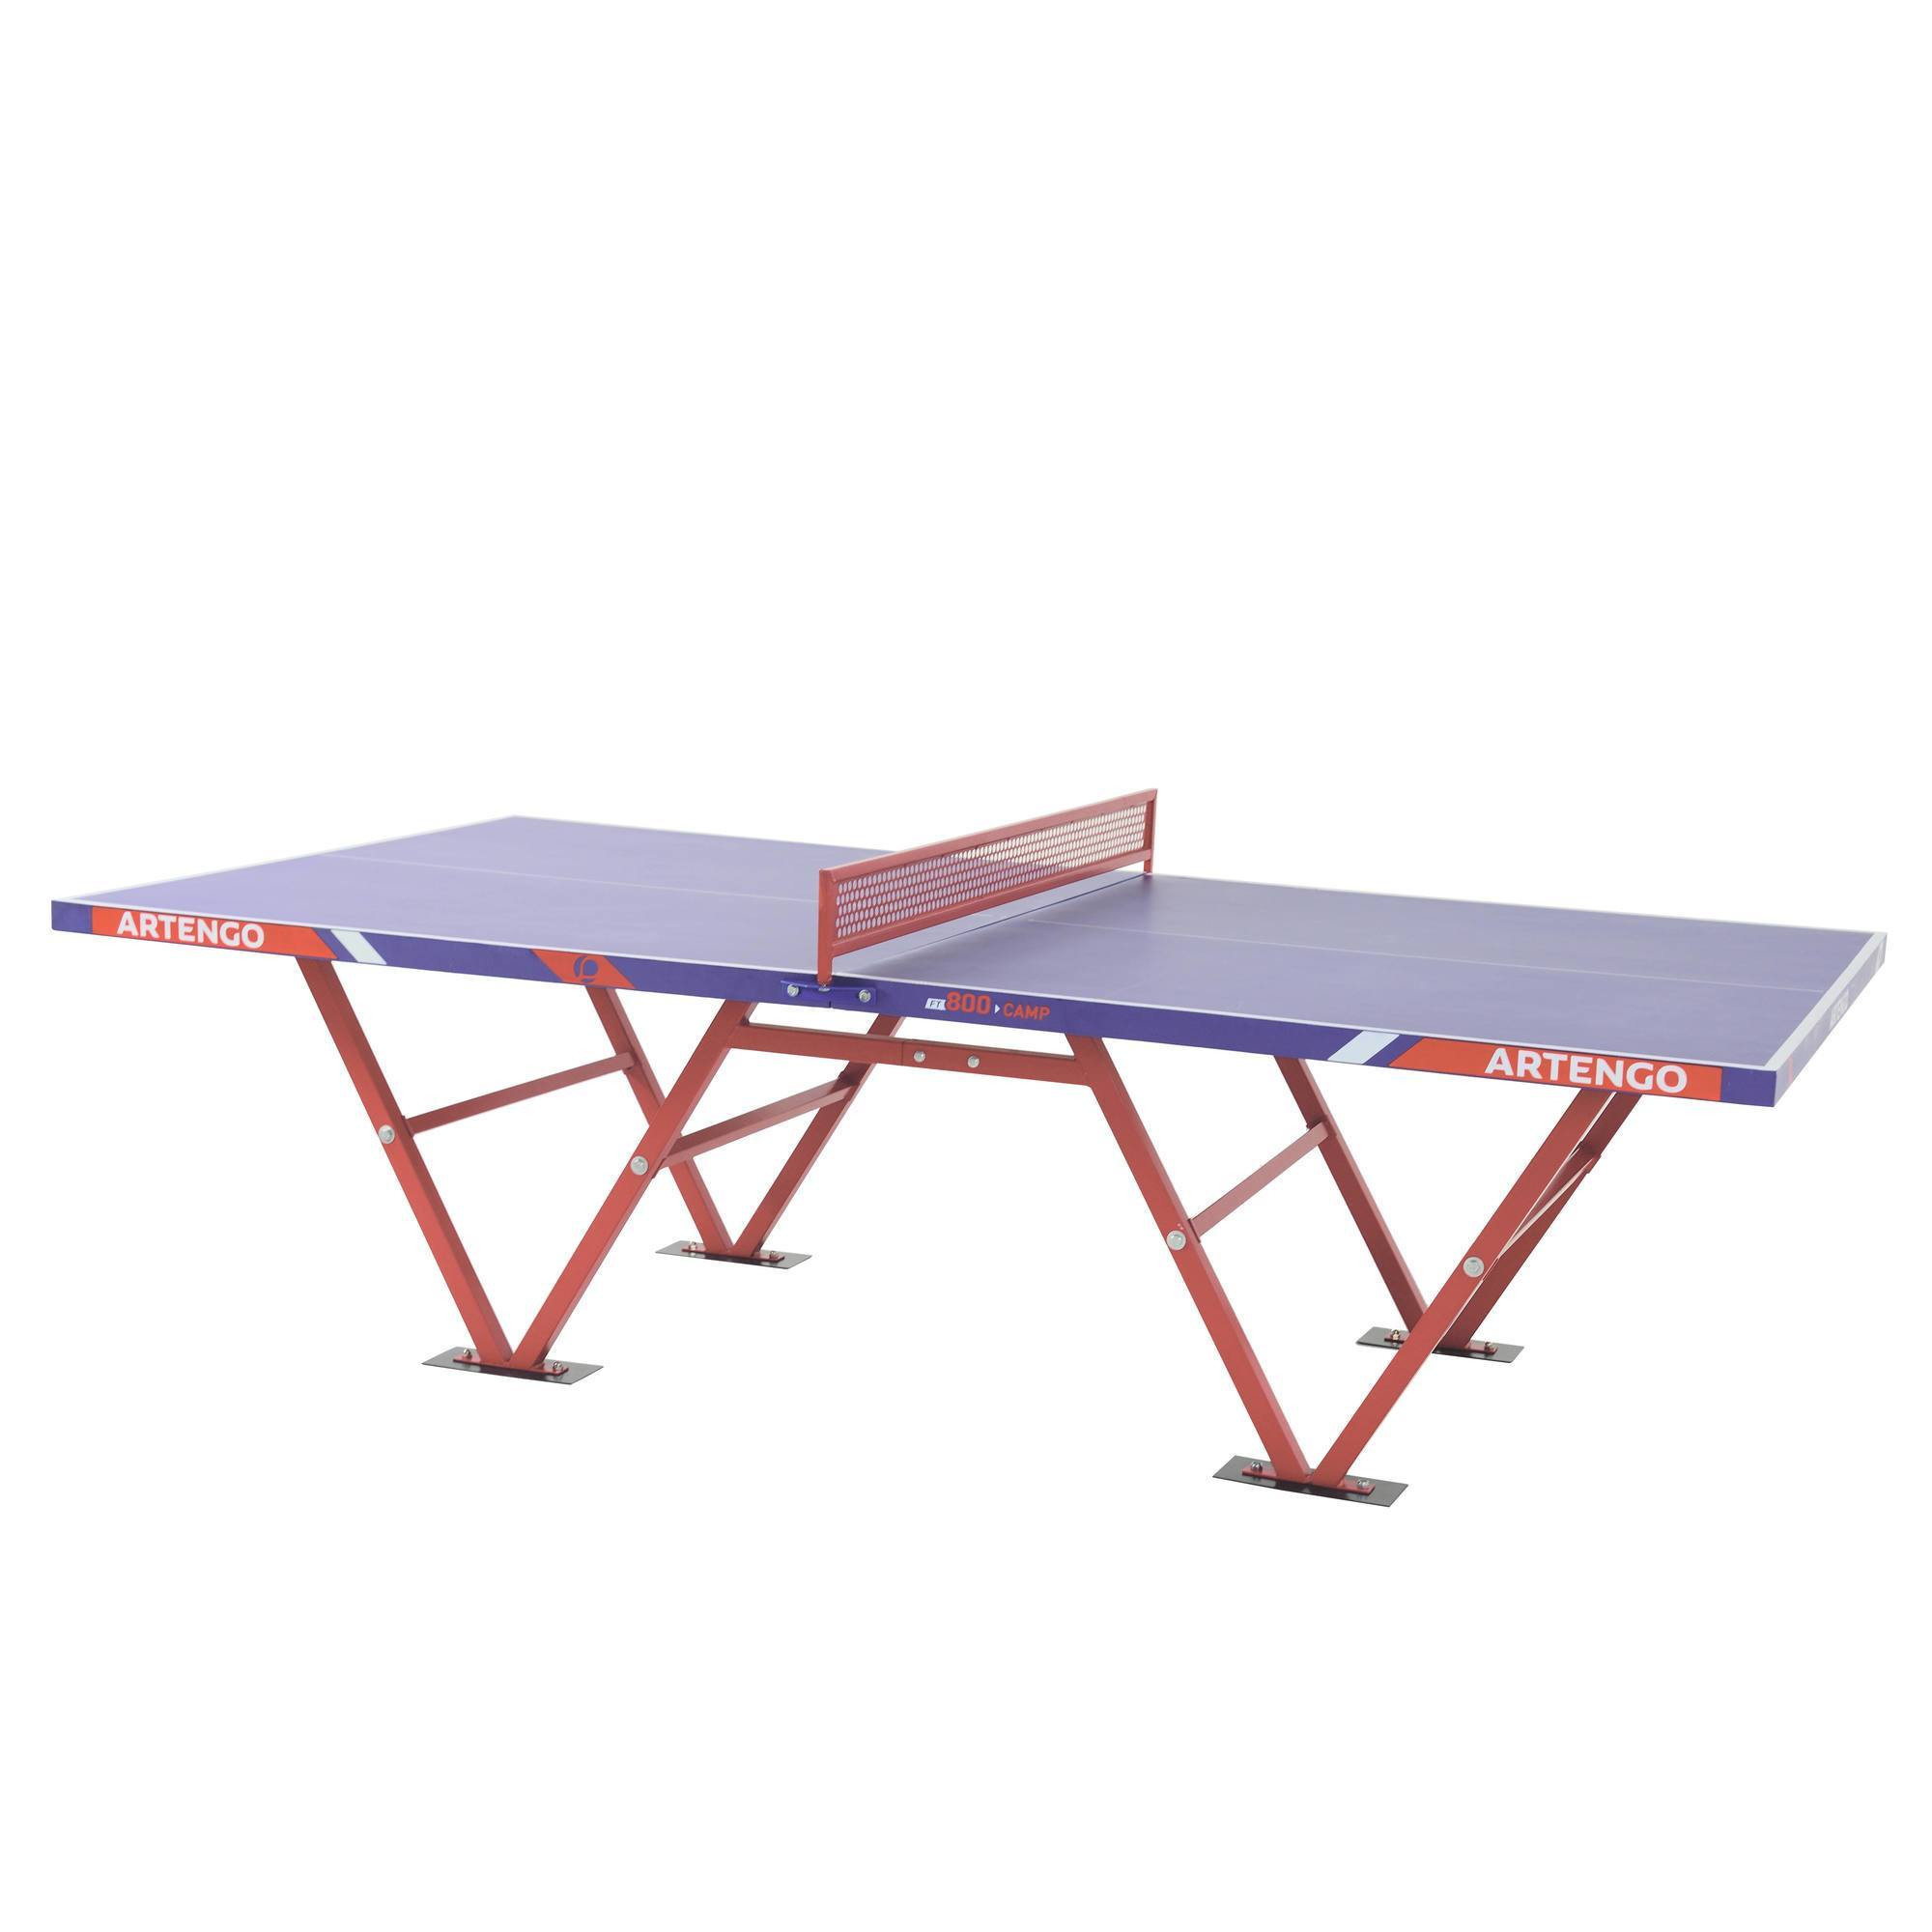 Table de ping pong pour collectivites artengo ft800 camp clubs collectivit s decathlon pro - Decathlon table de ping pong ...